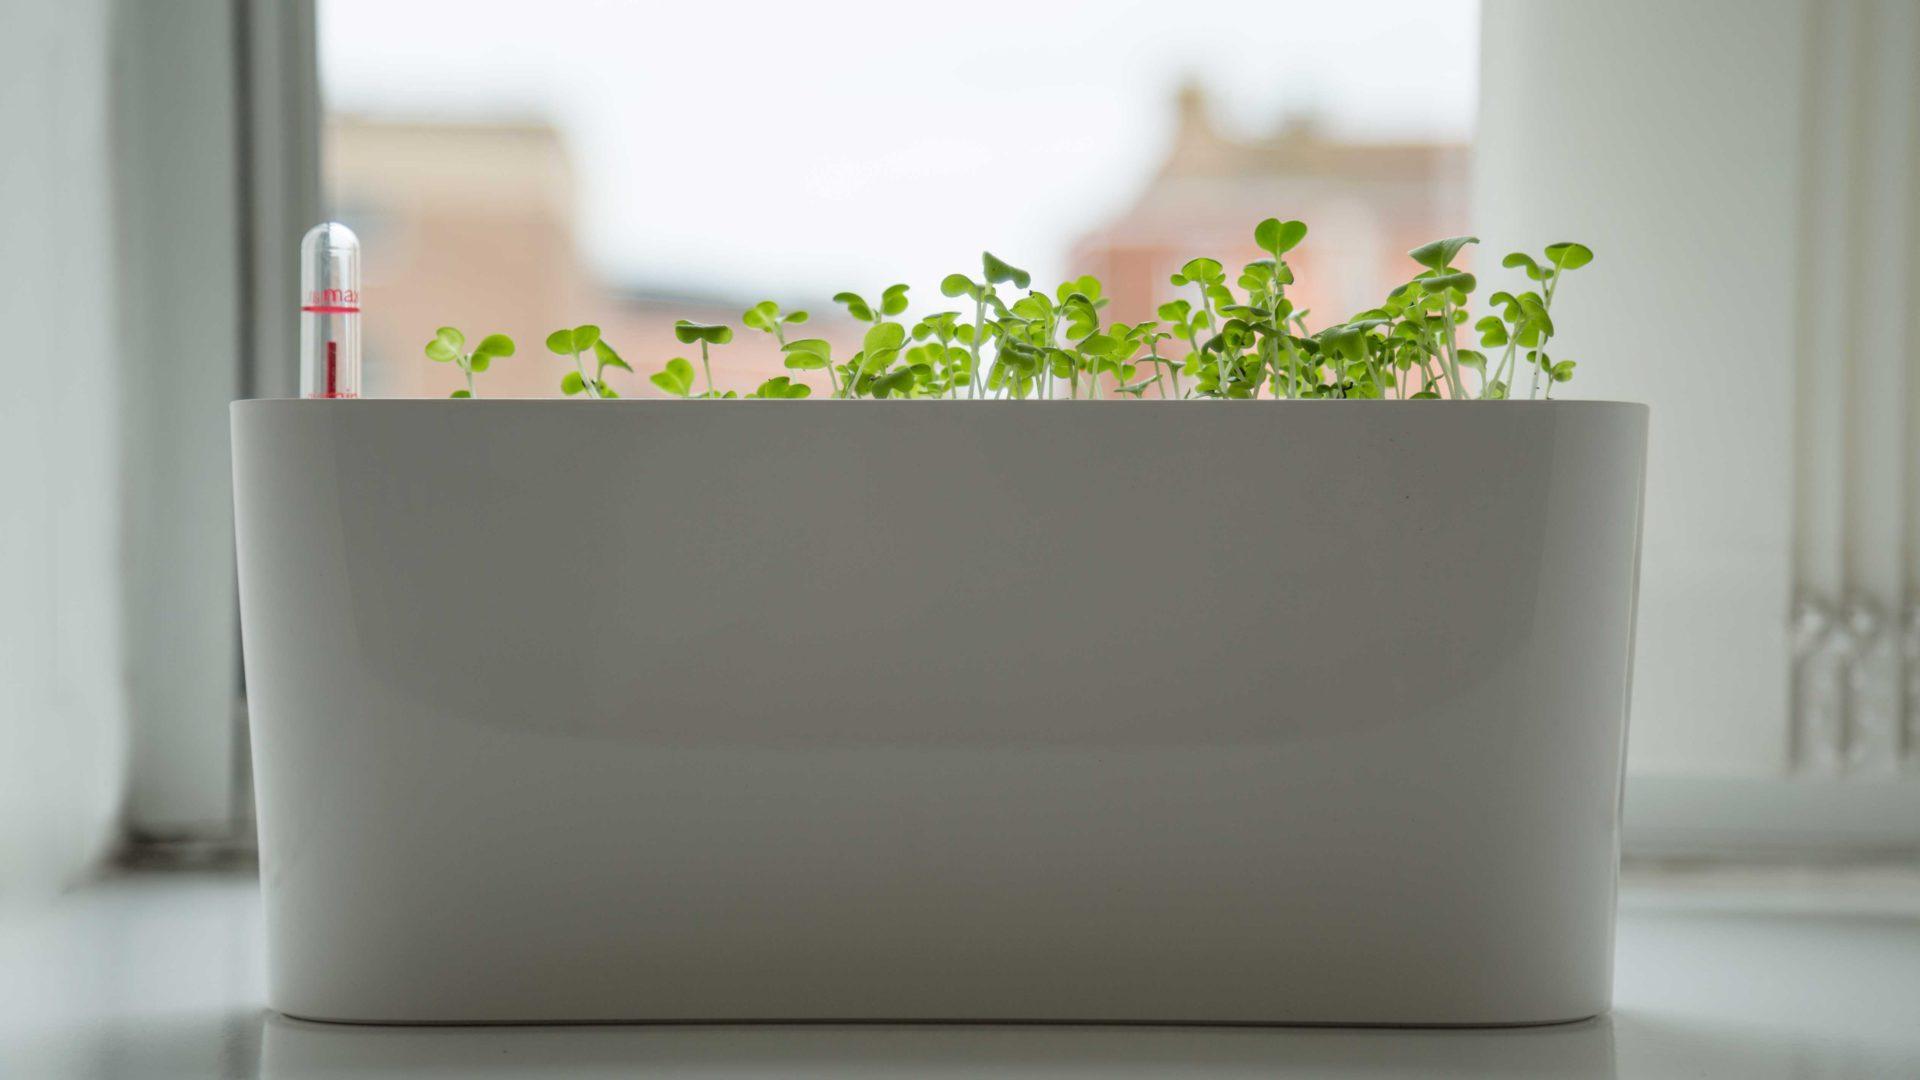 The FXhome herb garden